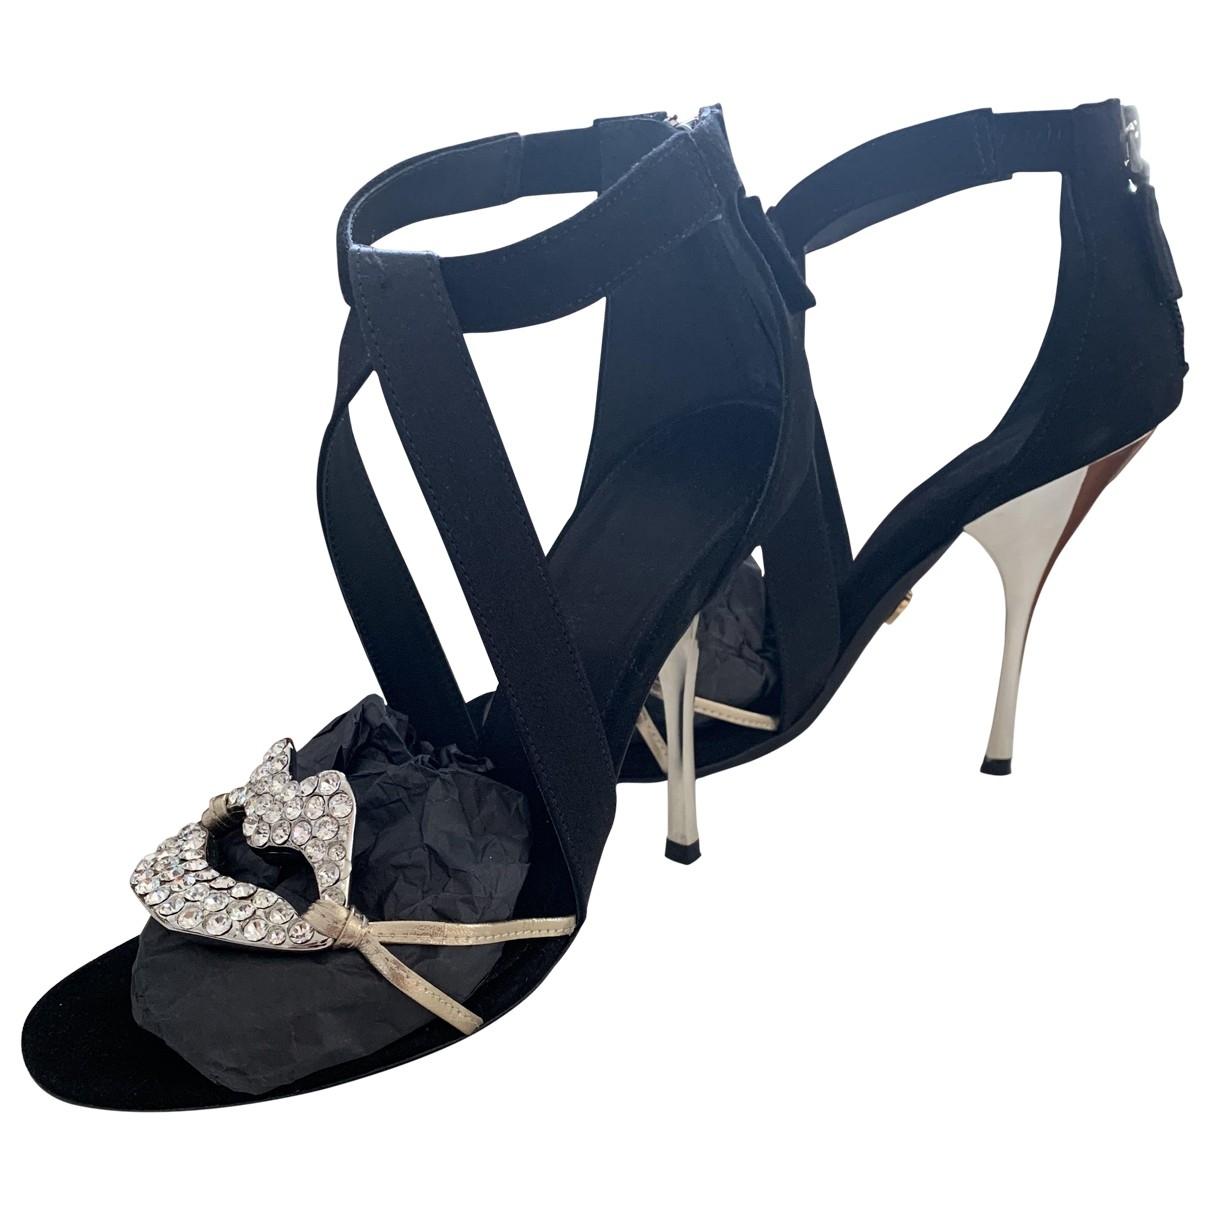 Giambattista Valli X H&m \N Black Leather Heels for Women 38 EU